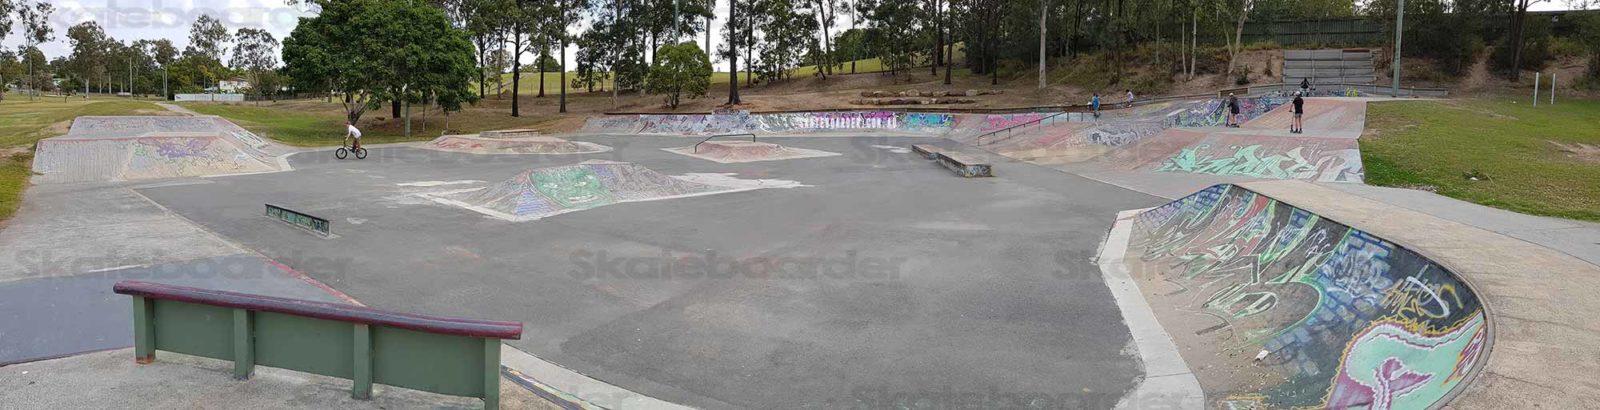 Woodridge Skate bowl wide view